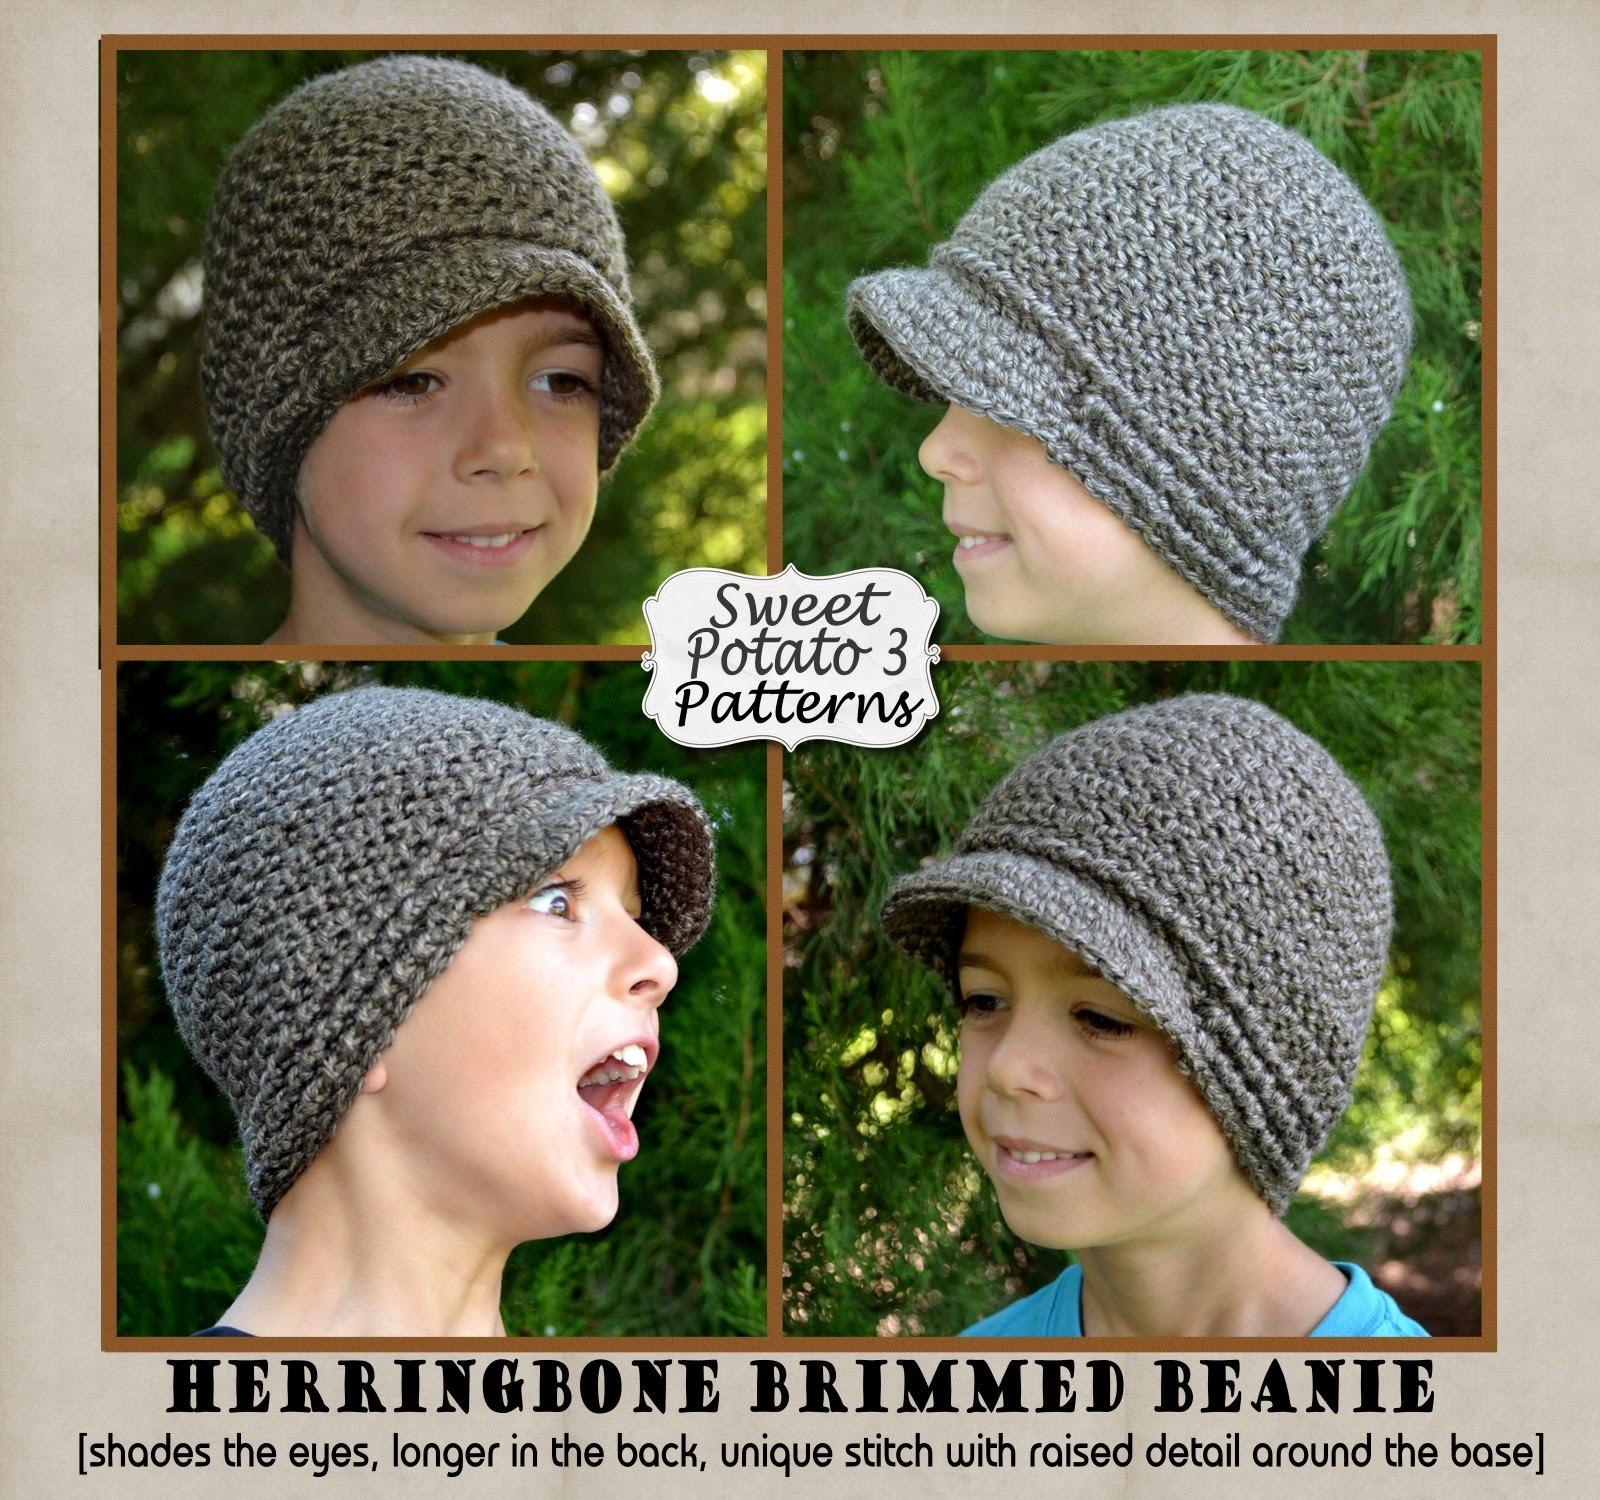 Herringbone Brimmed Beanie Pattern Release